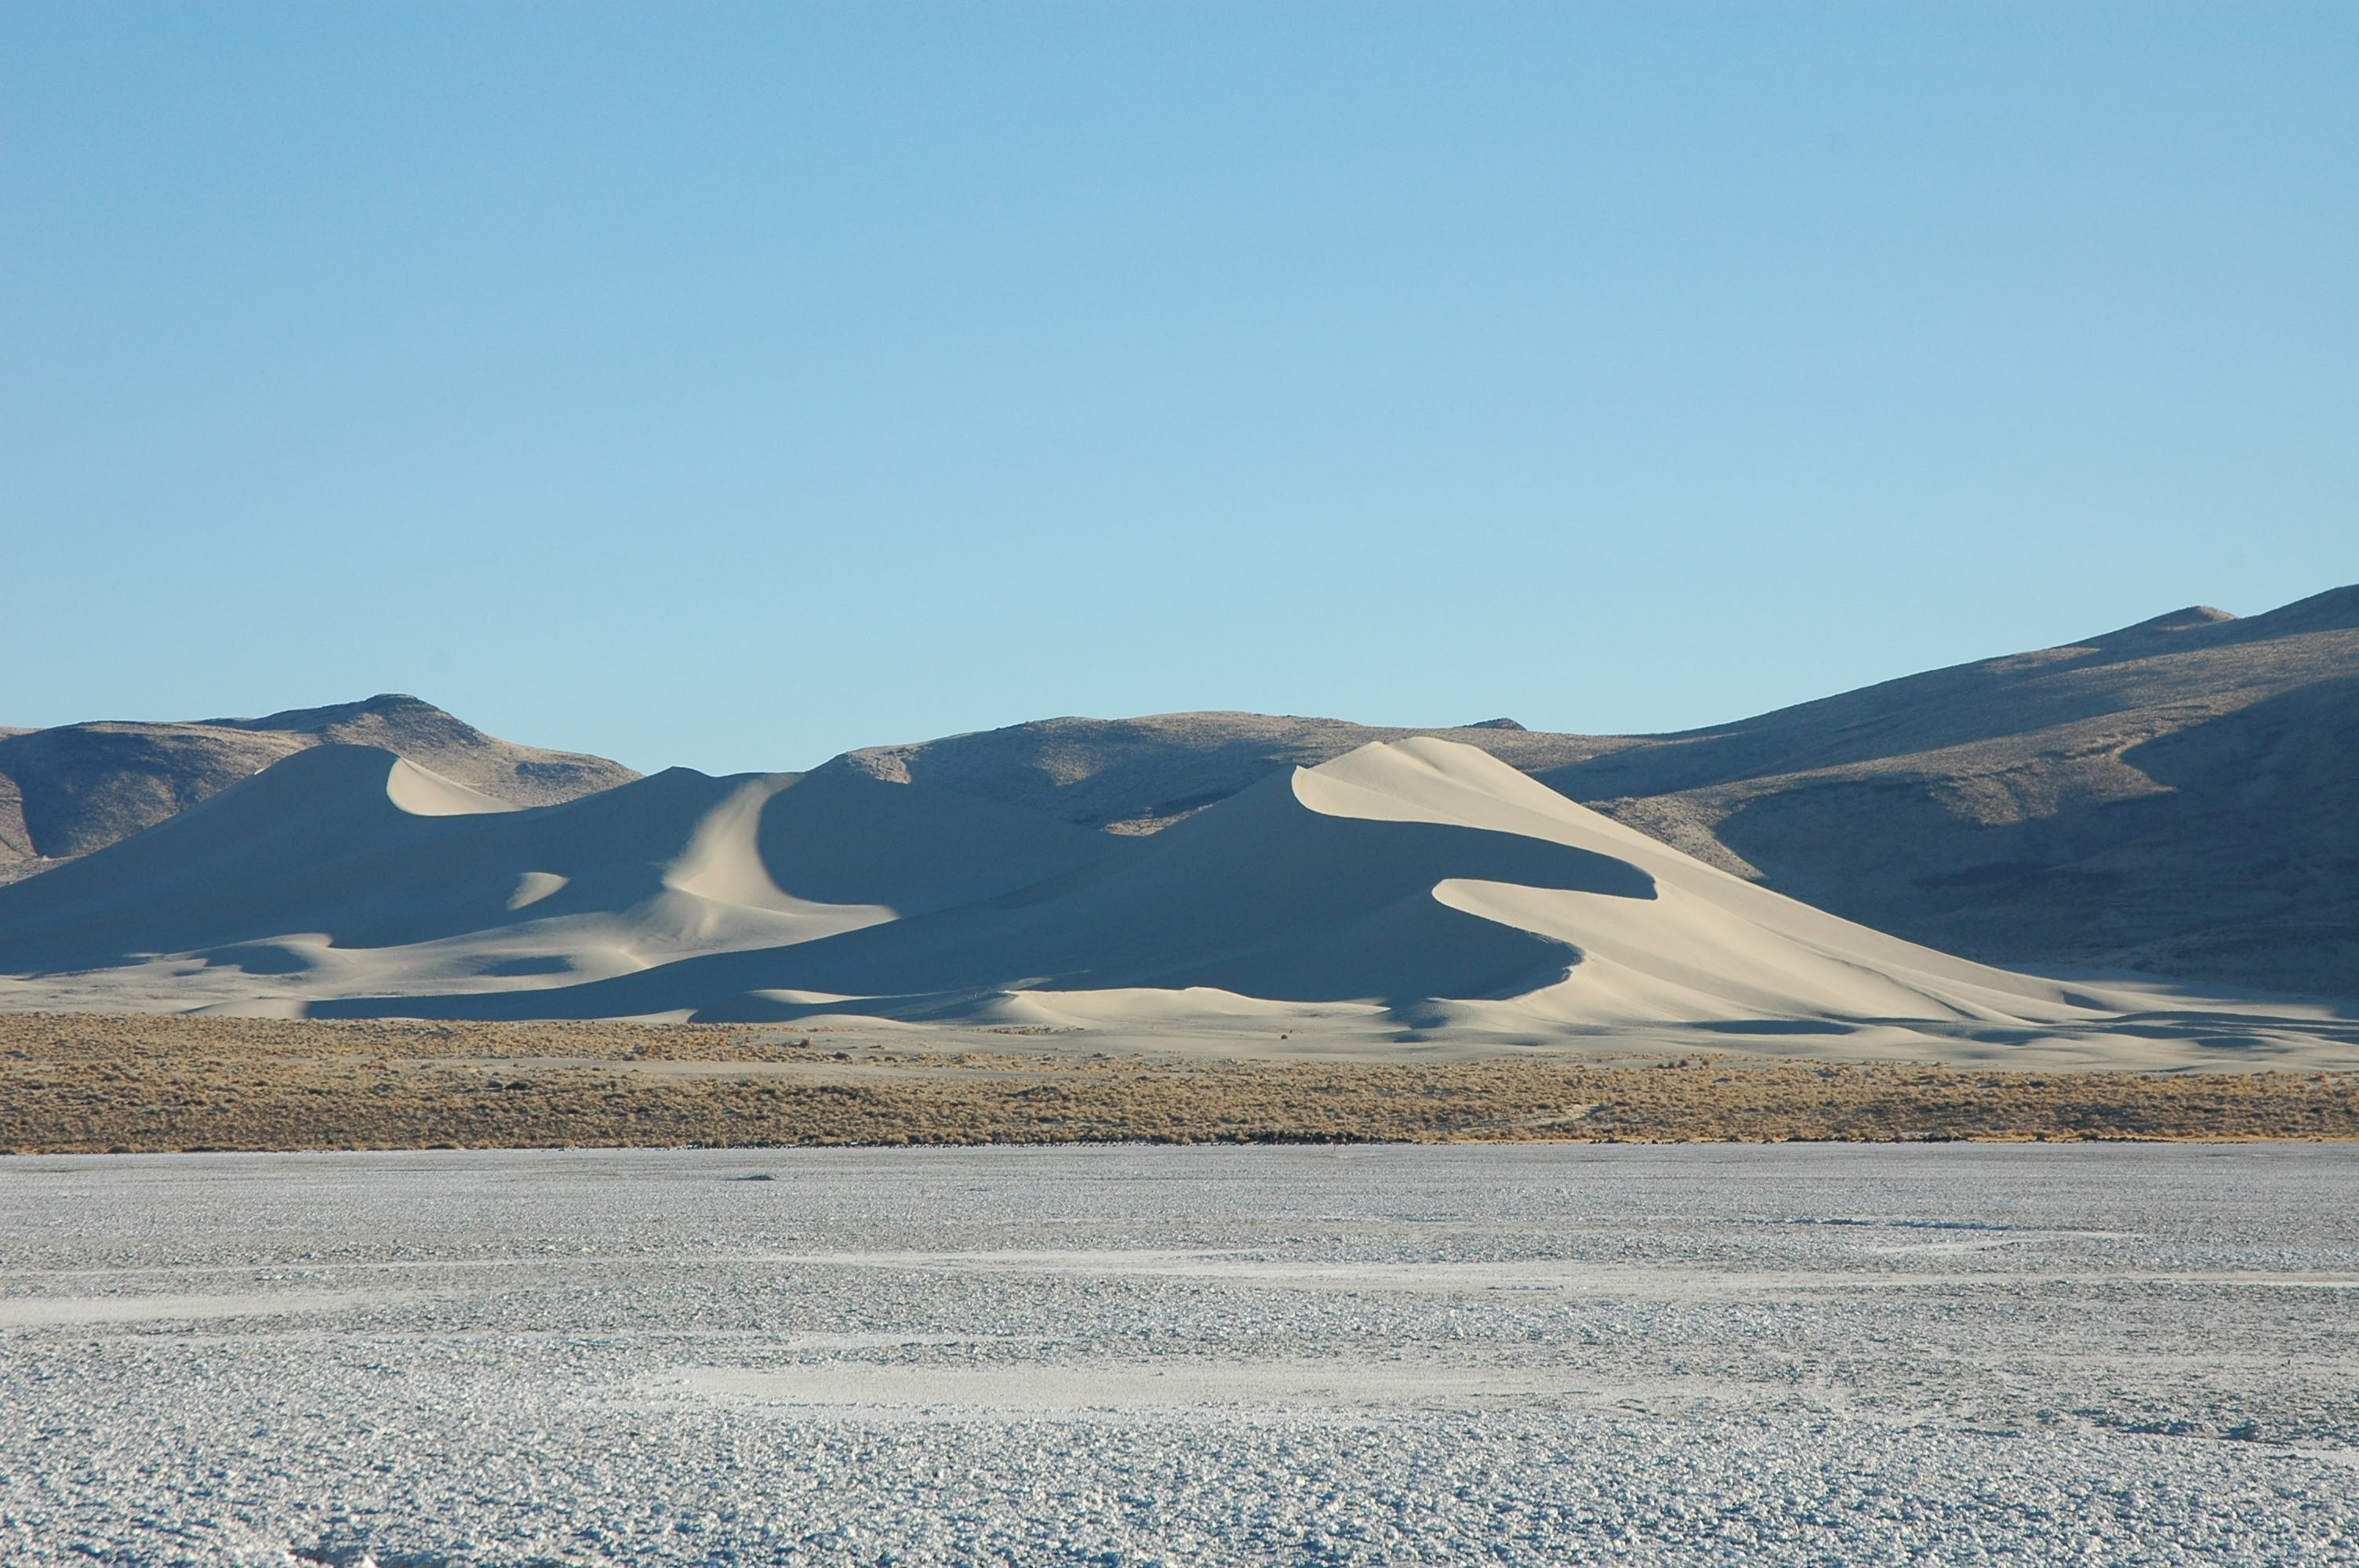 Pony Express Territory dunes